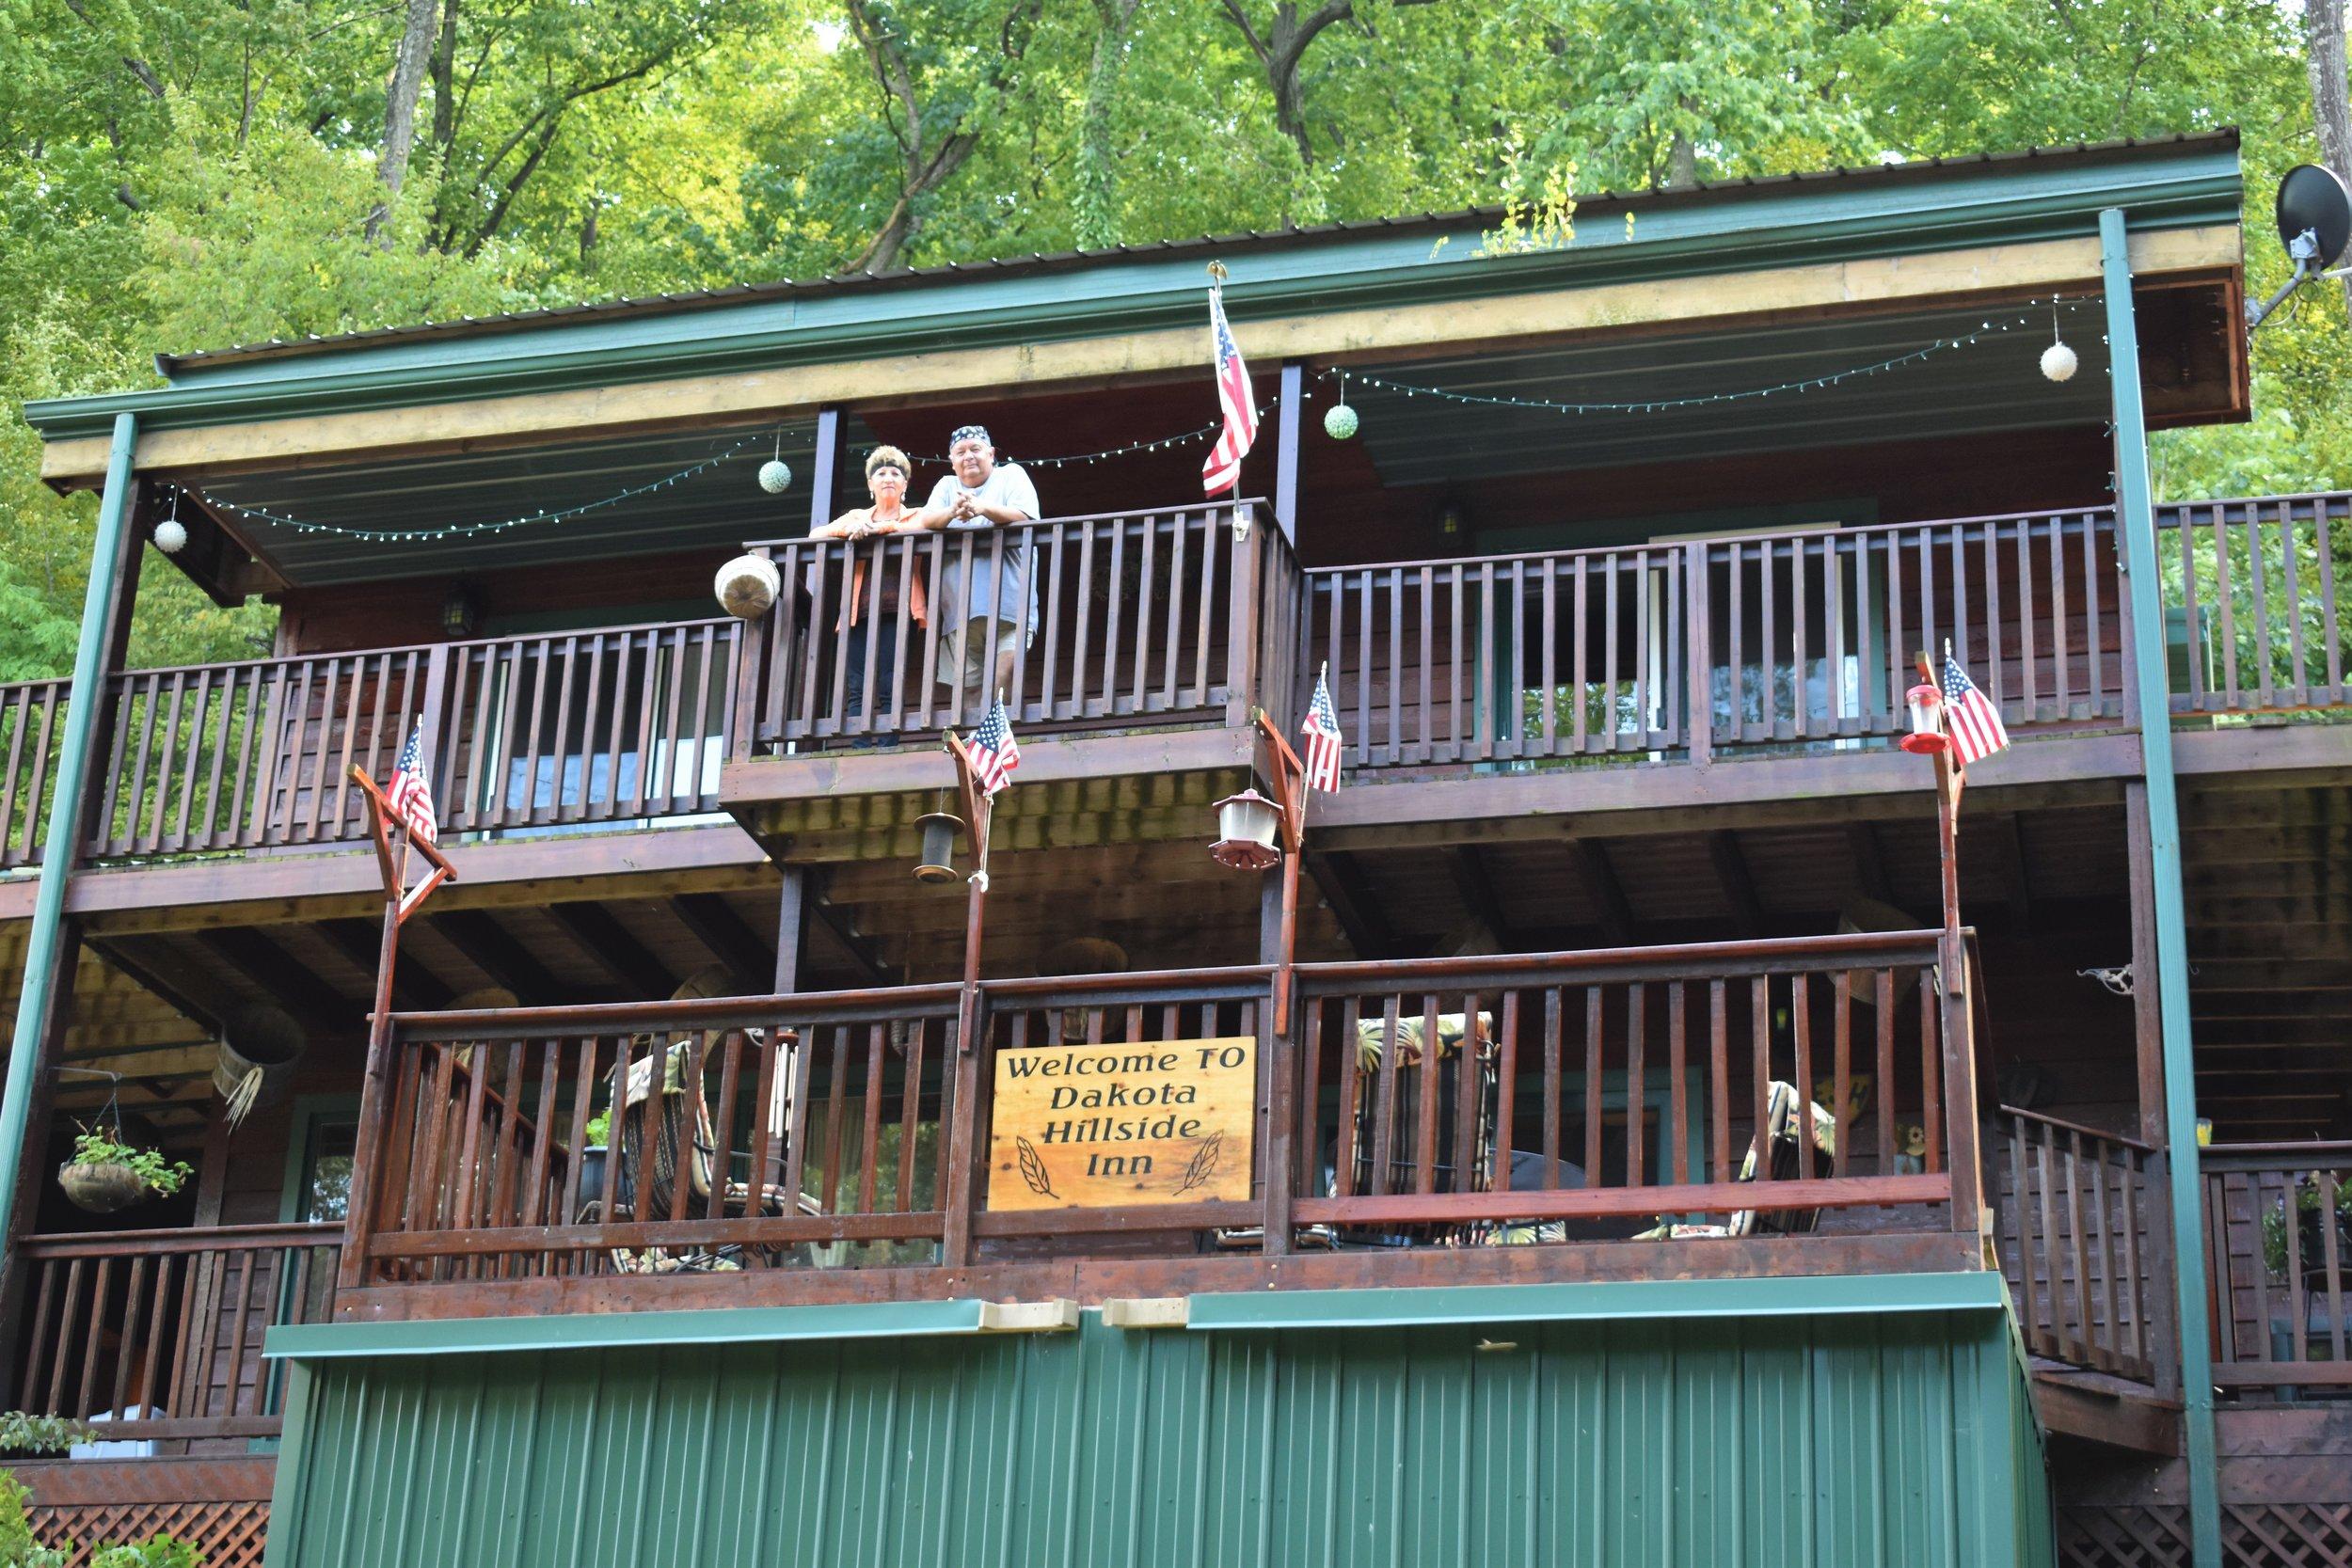 Ron and Barb Redwing- The Dakota Hillside Inn